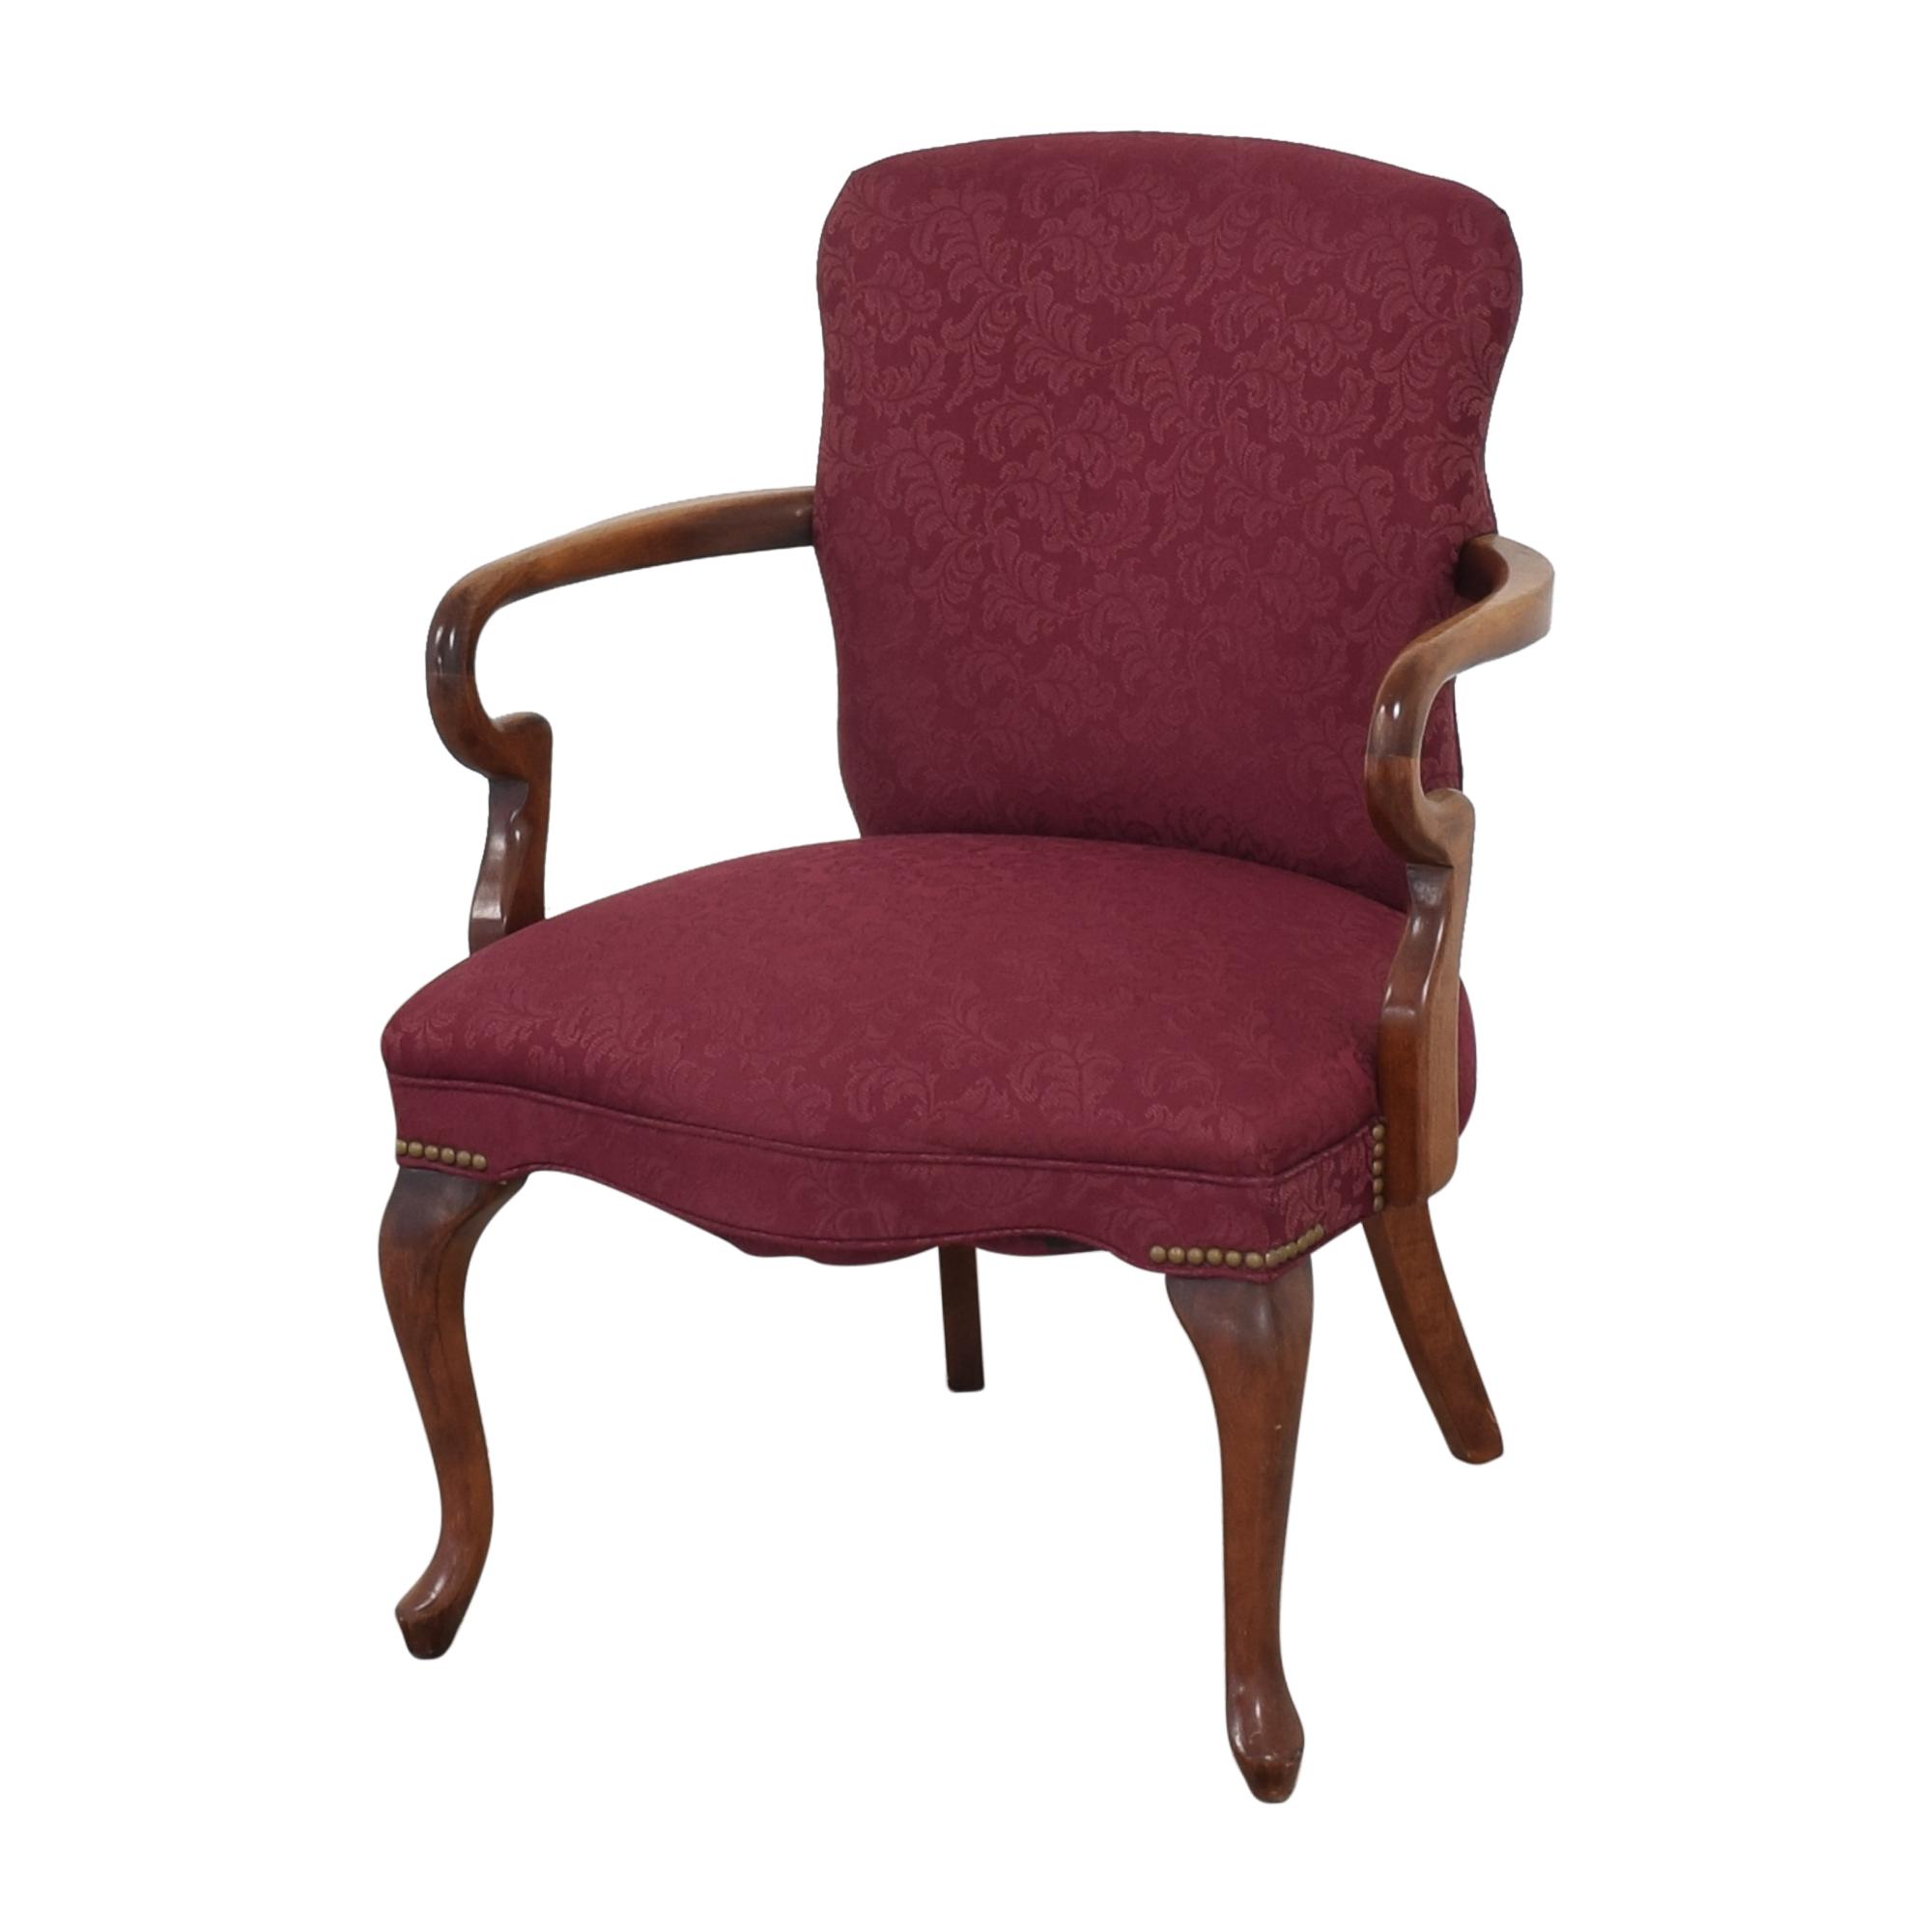 Ethan Allen Ethan Allen Accent Chair for sale